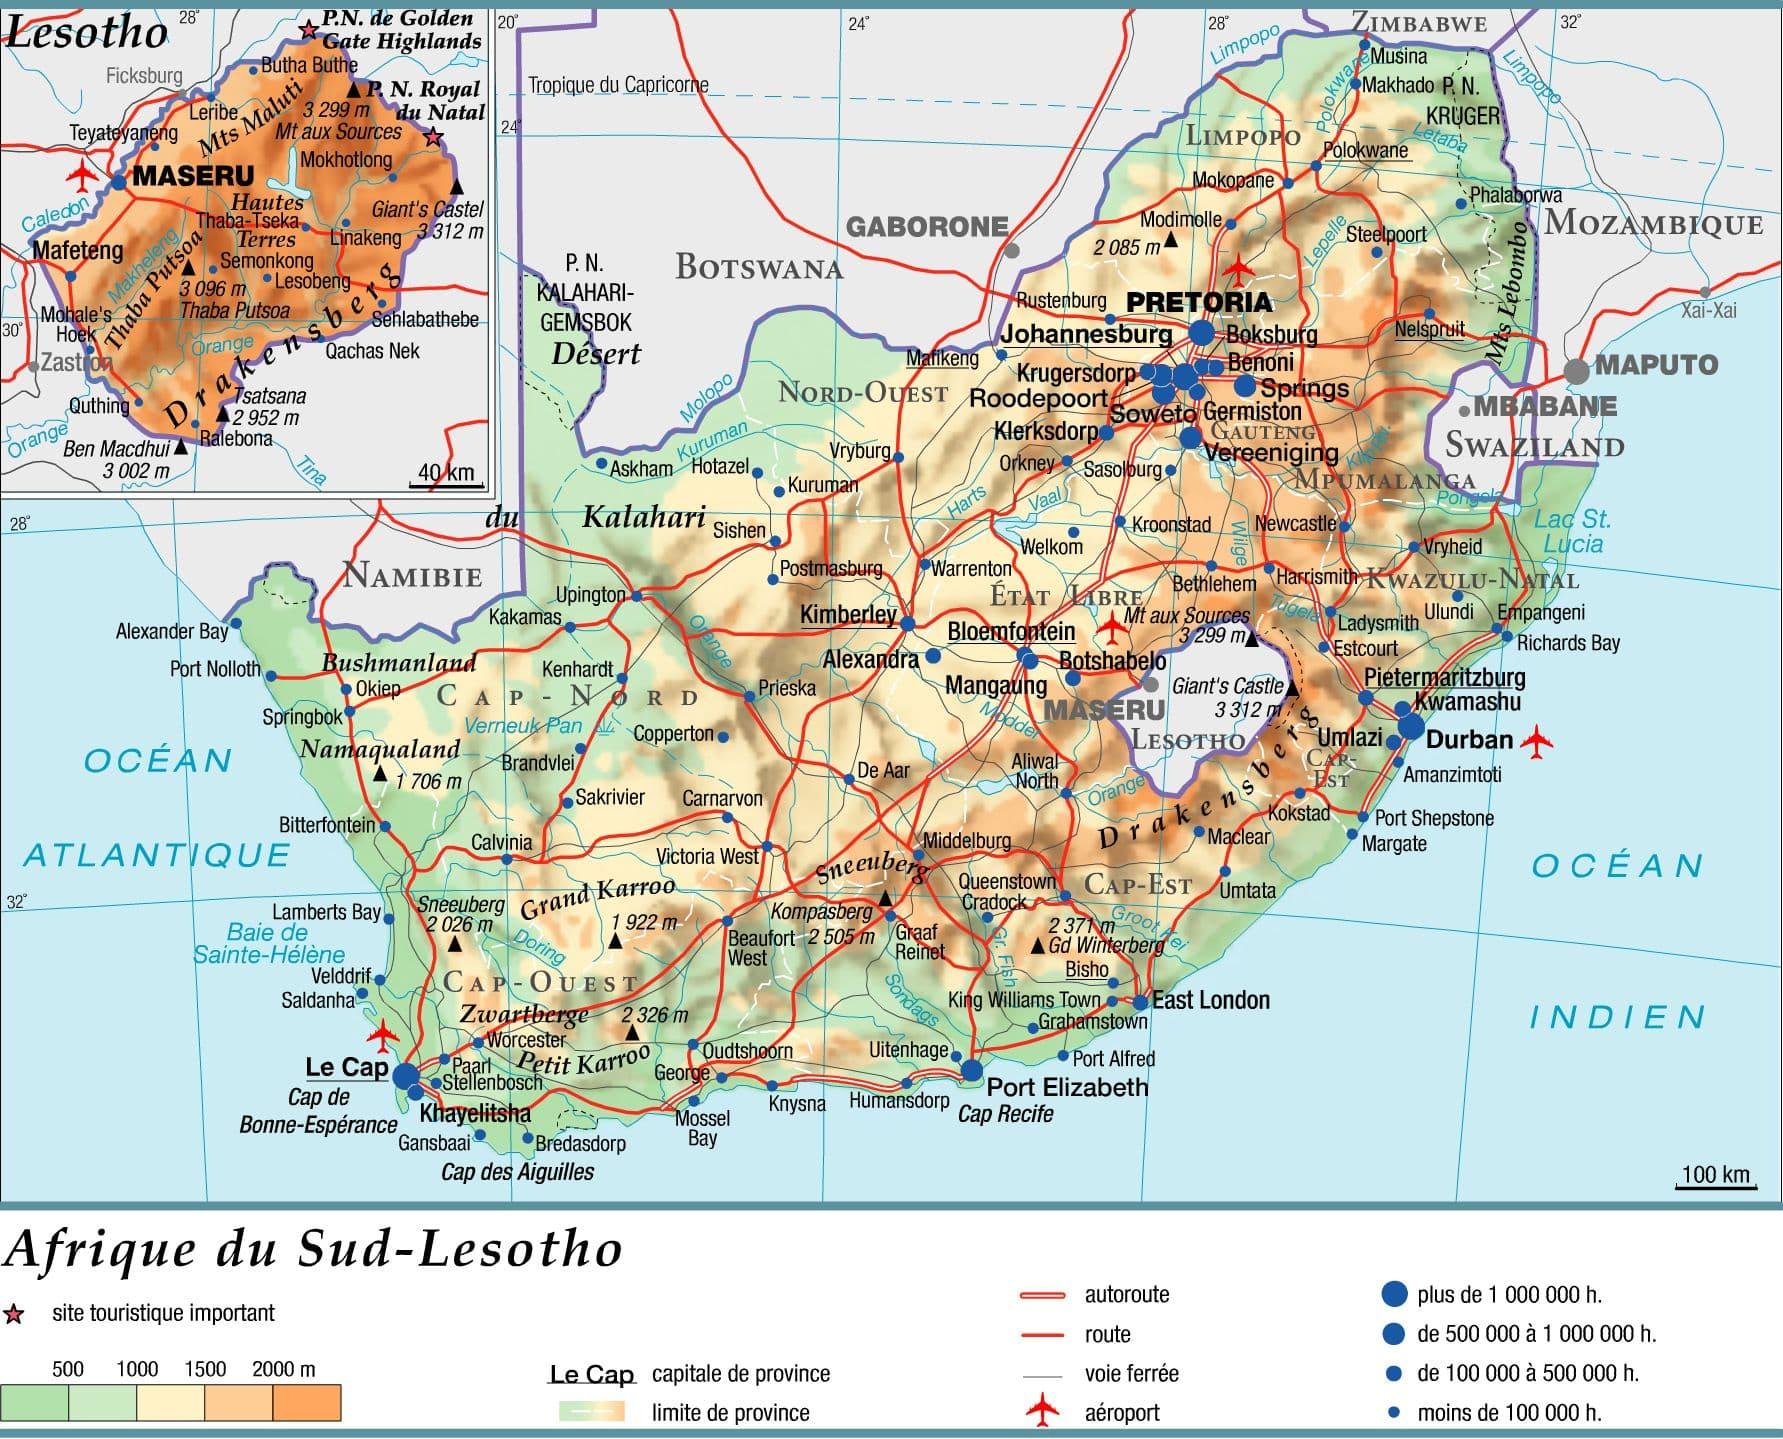 carte afrique du sud - g u00e9ographie